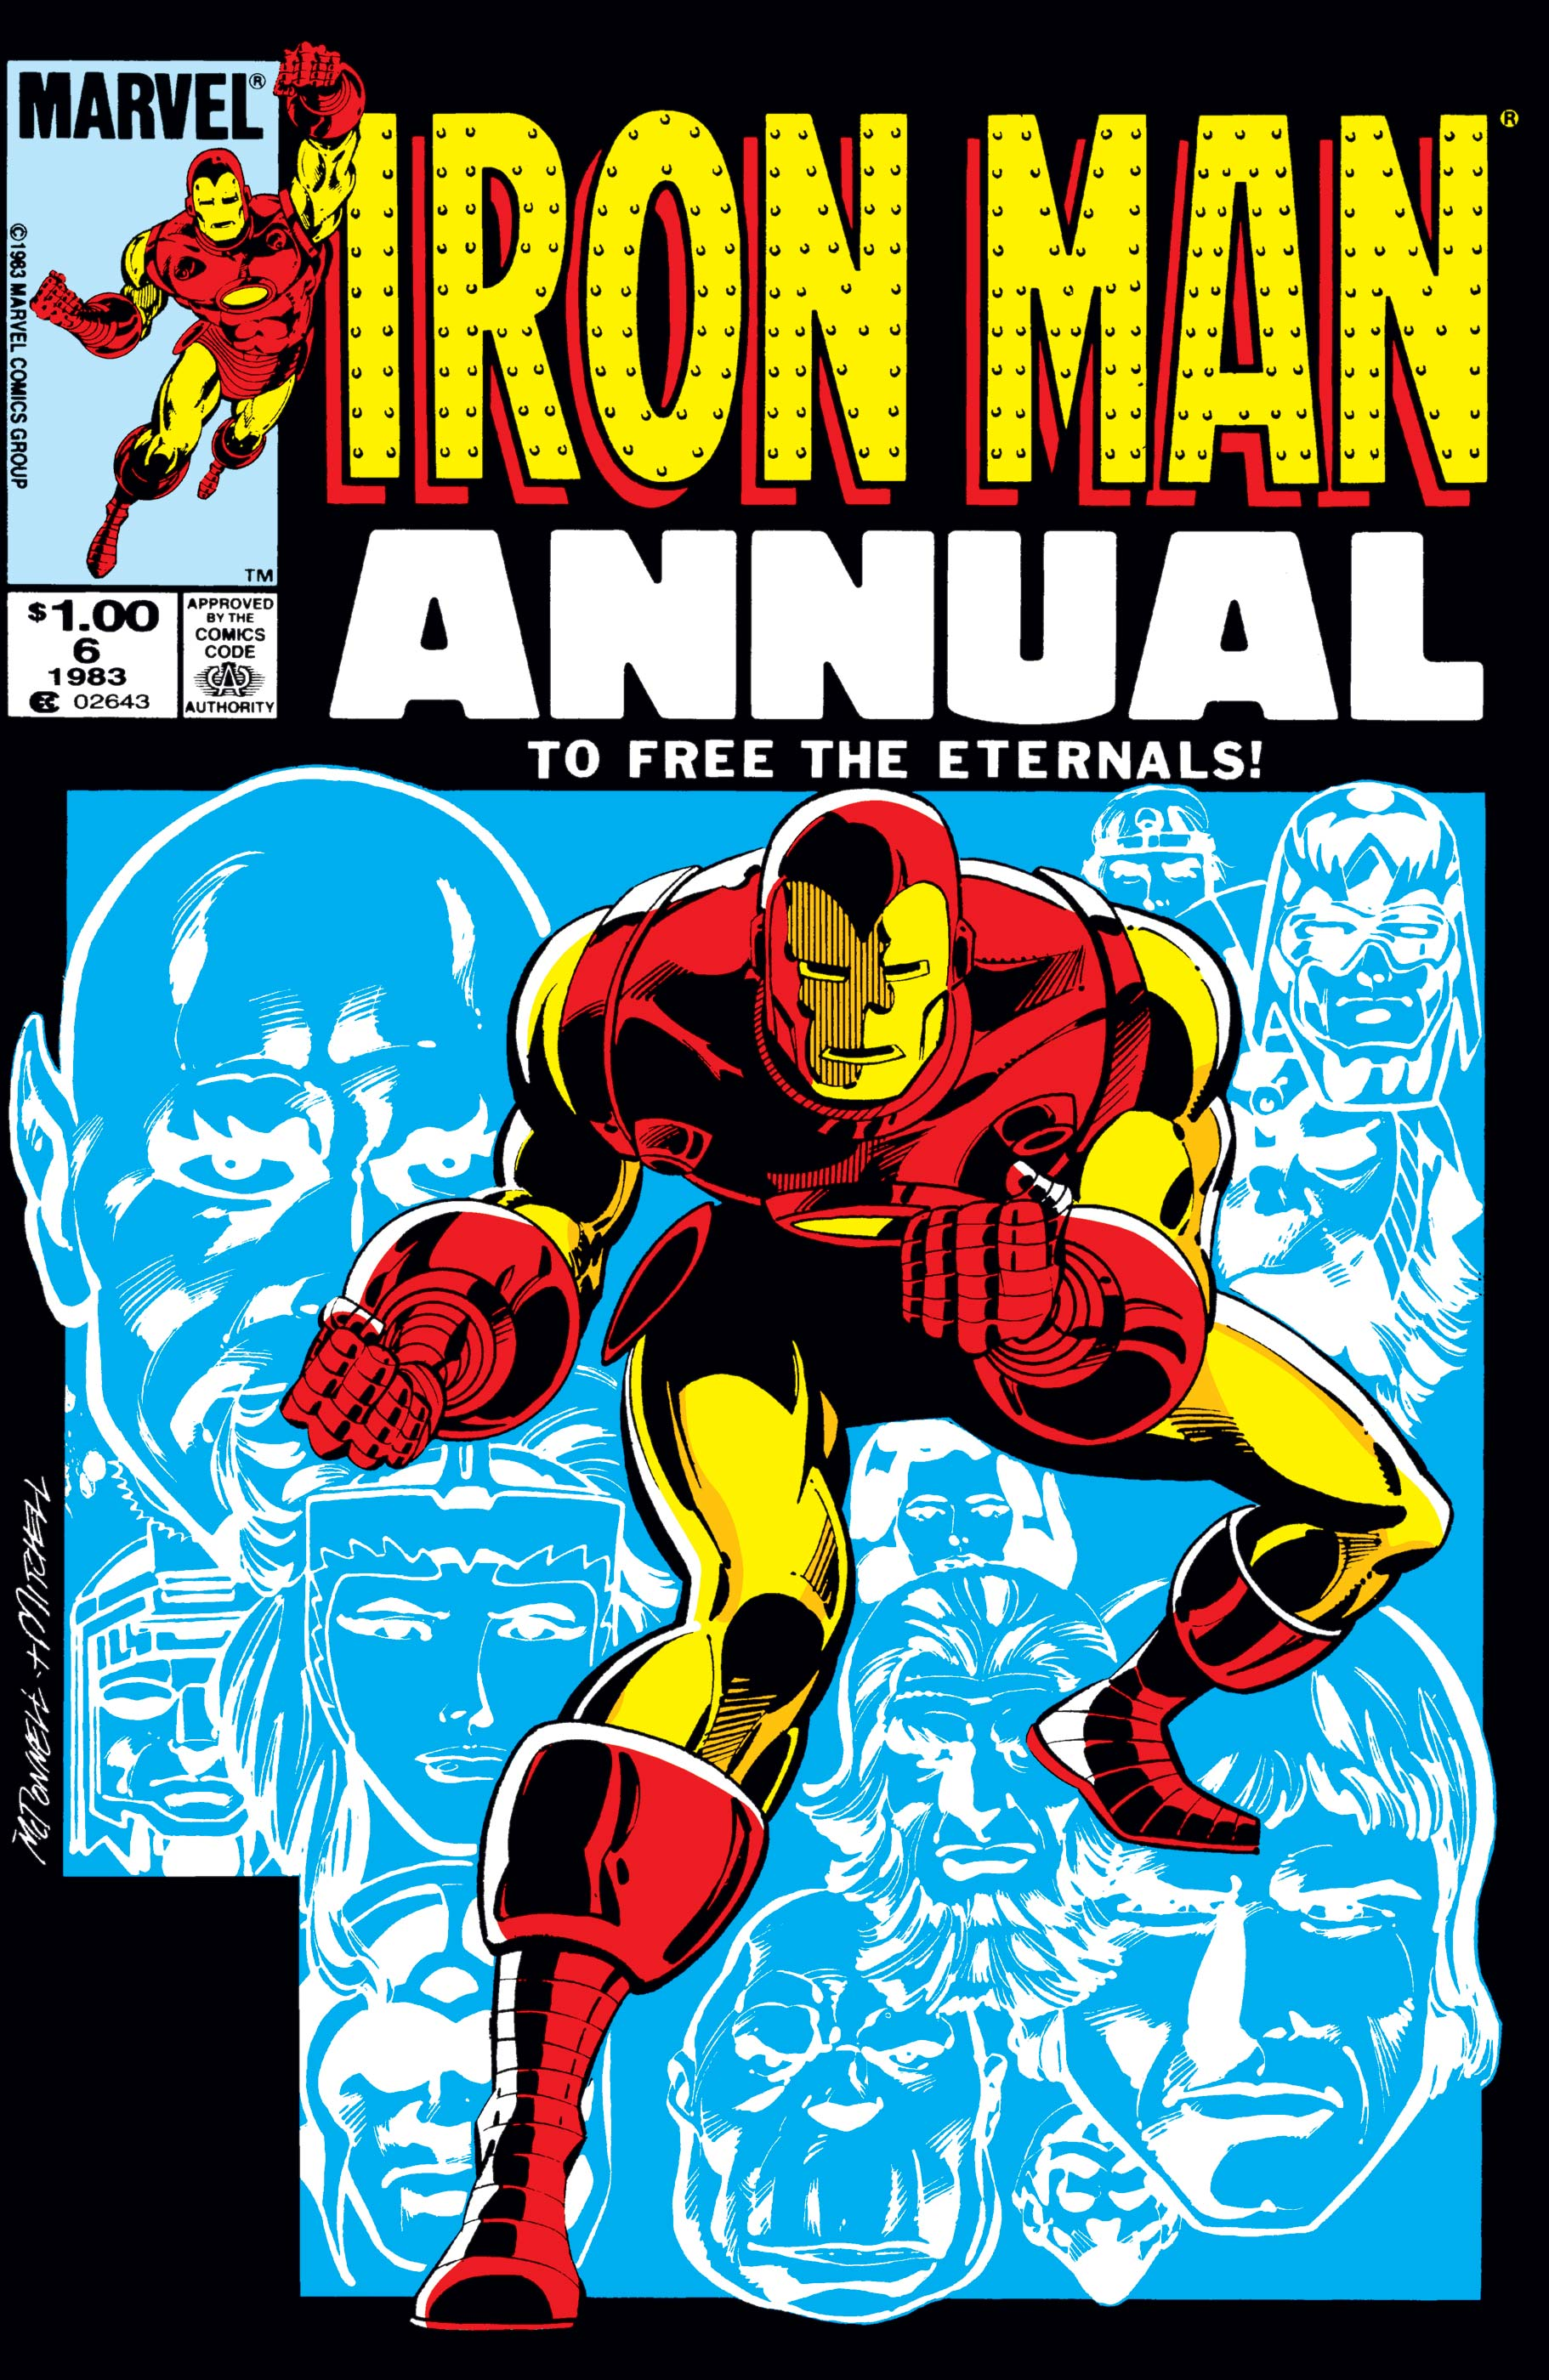 Iron Man Annual (1976) #6